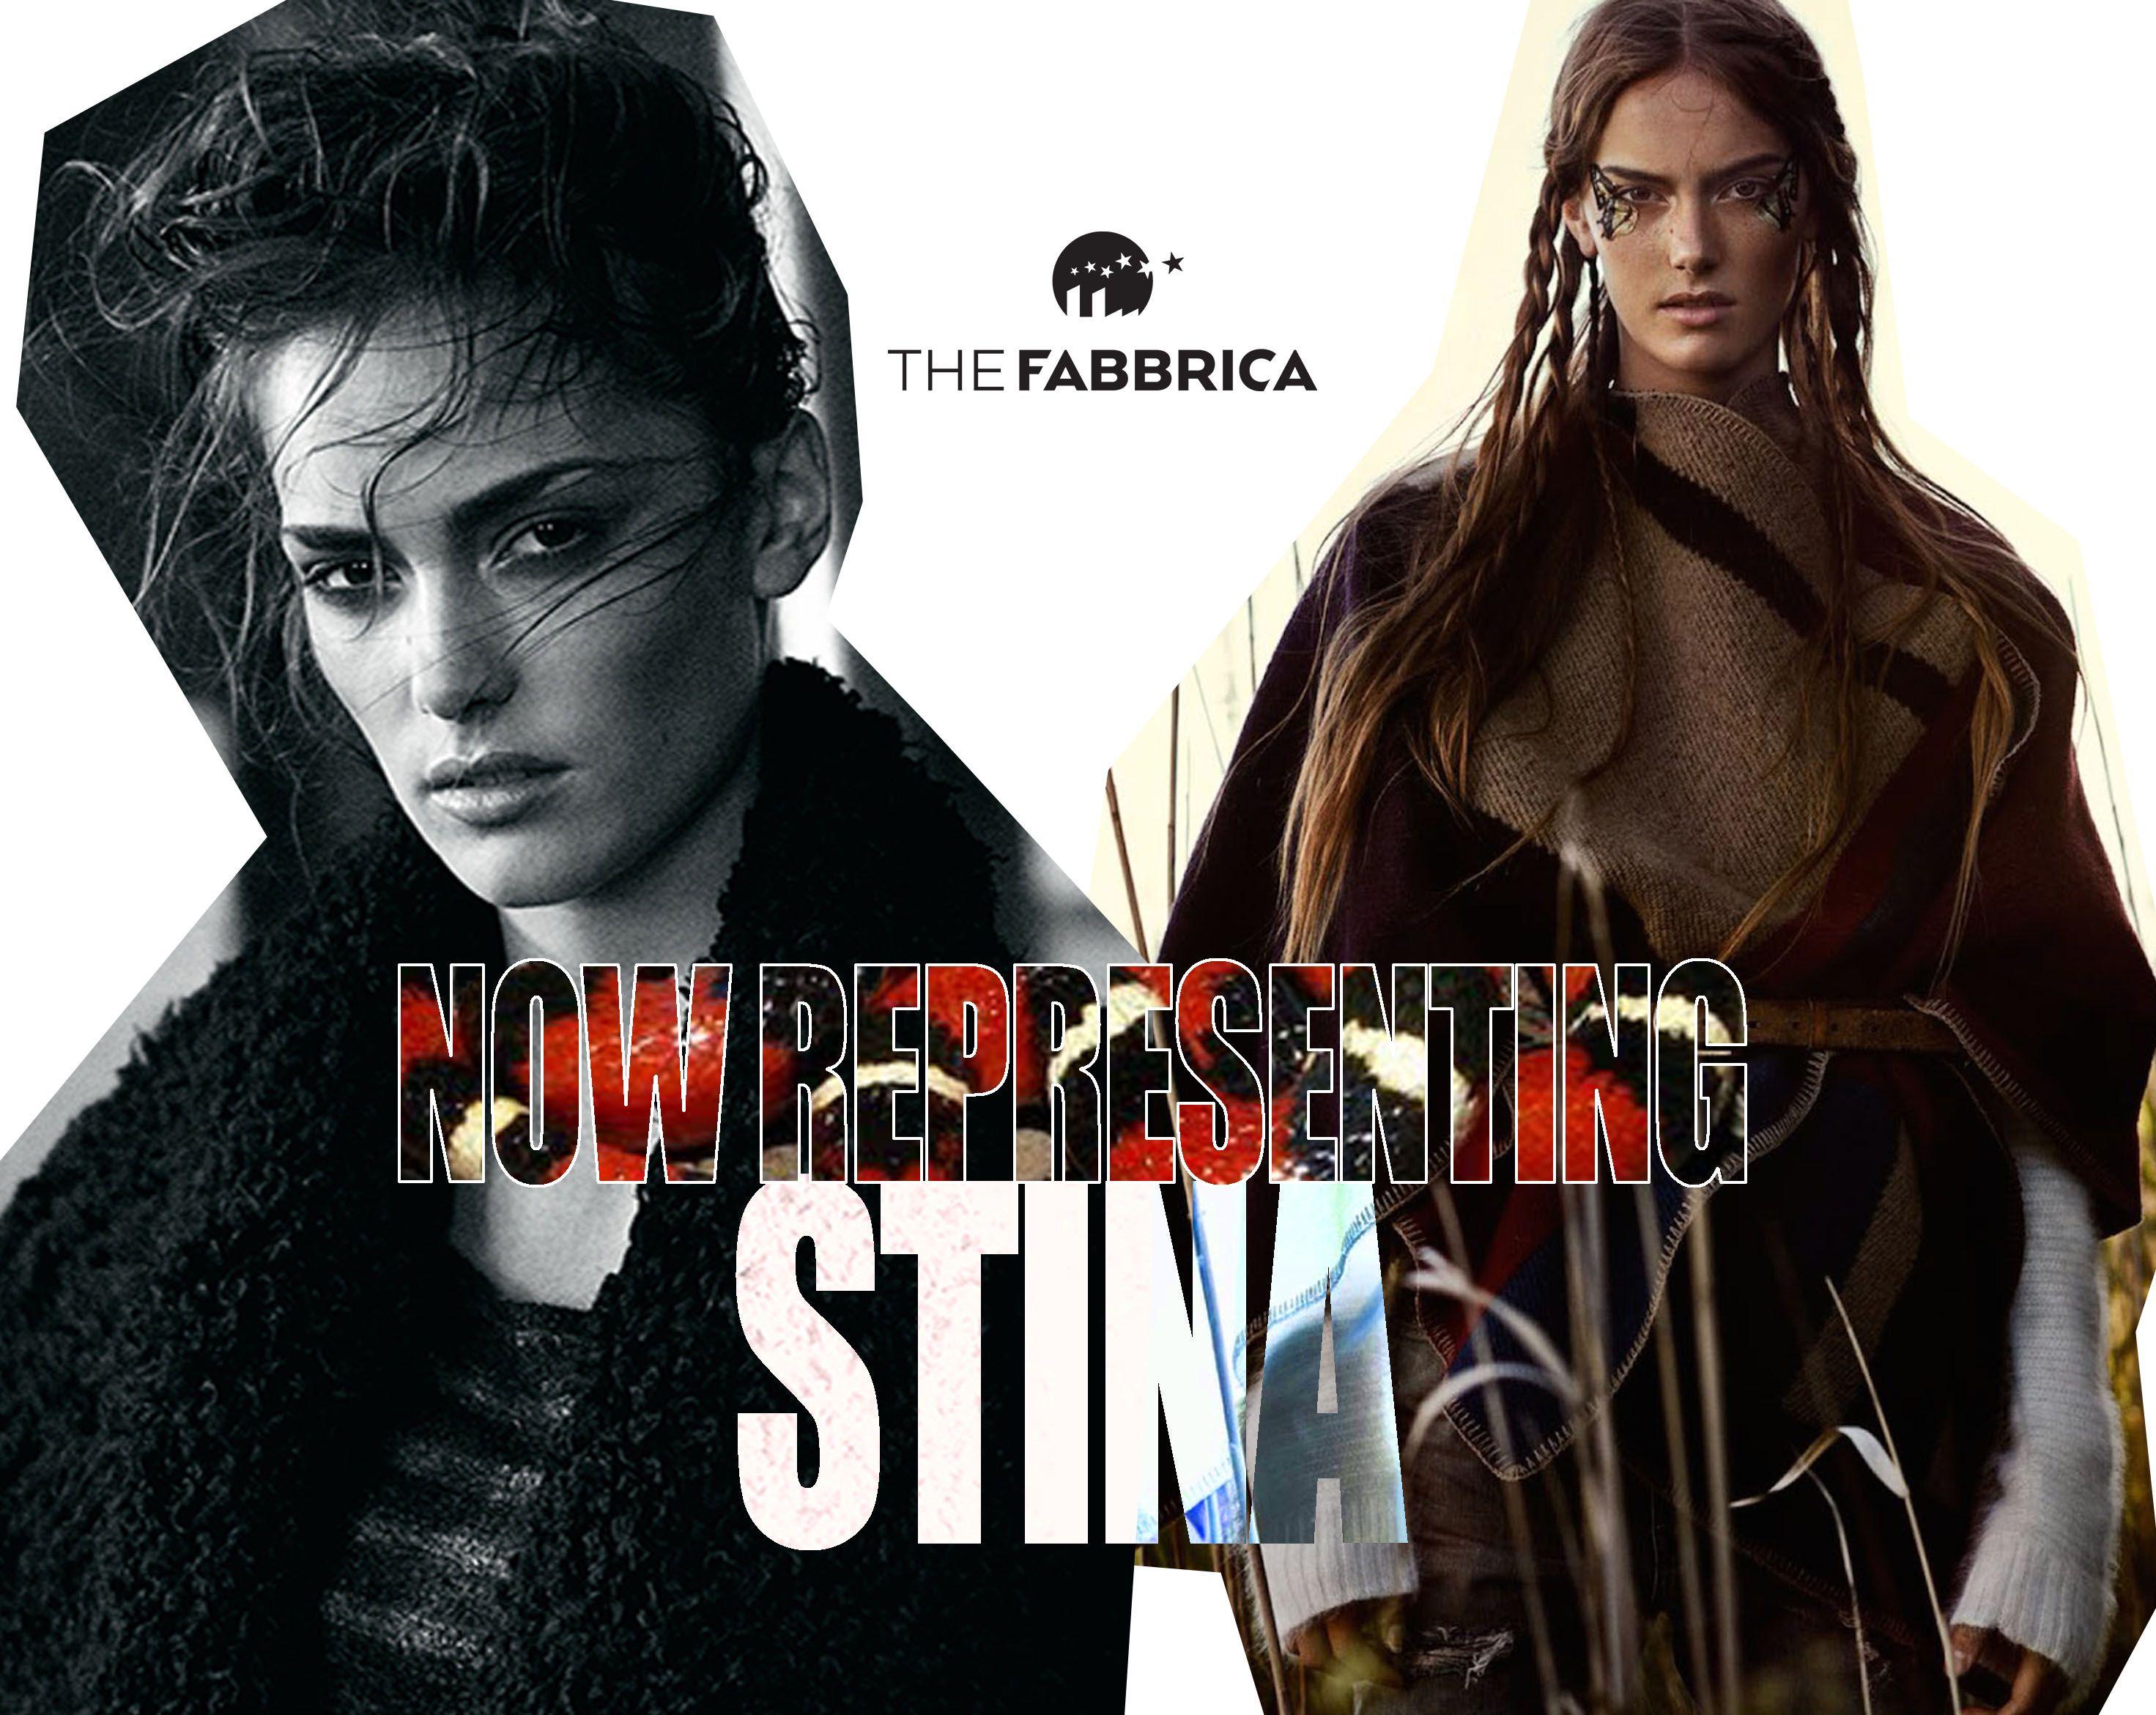 #StinaOlsson